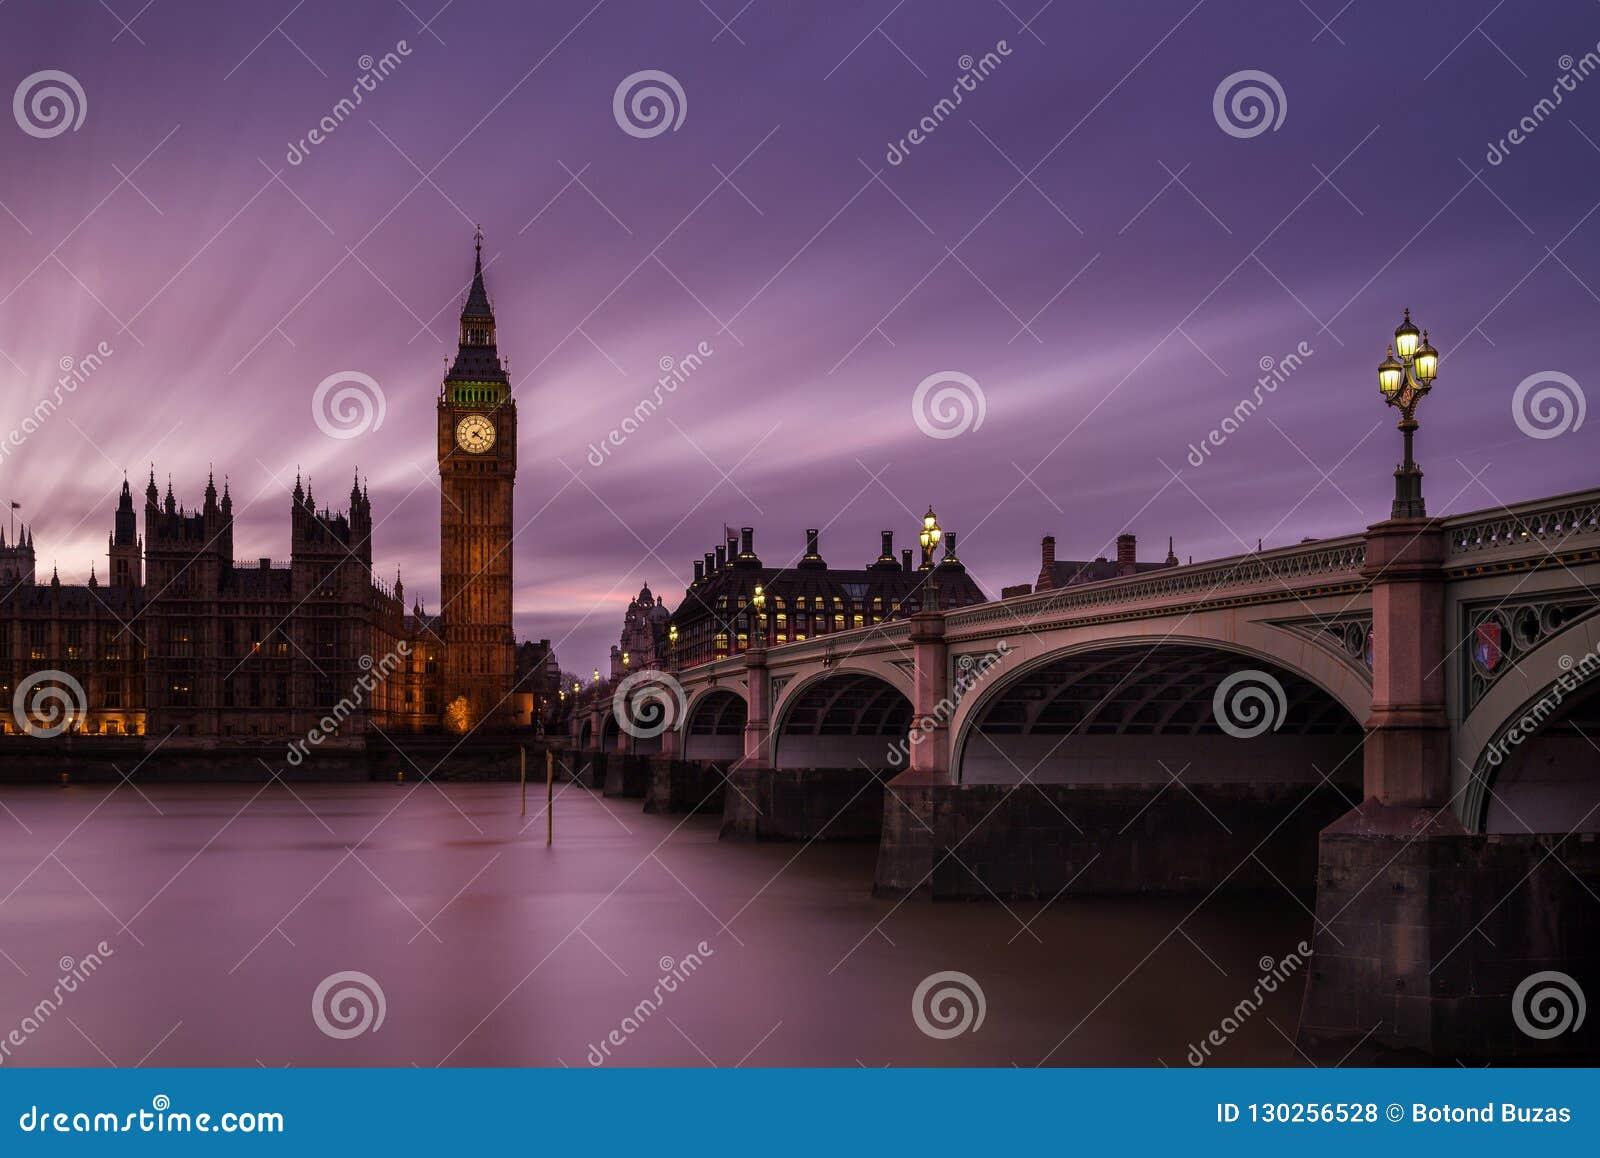 Big Ben at twilight London